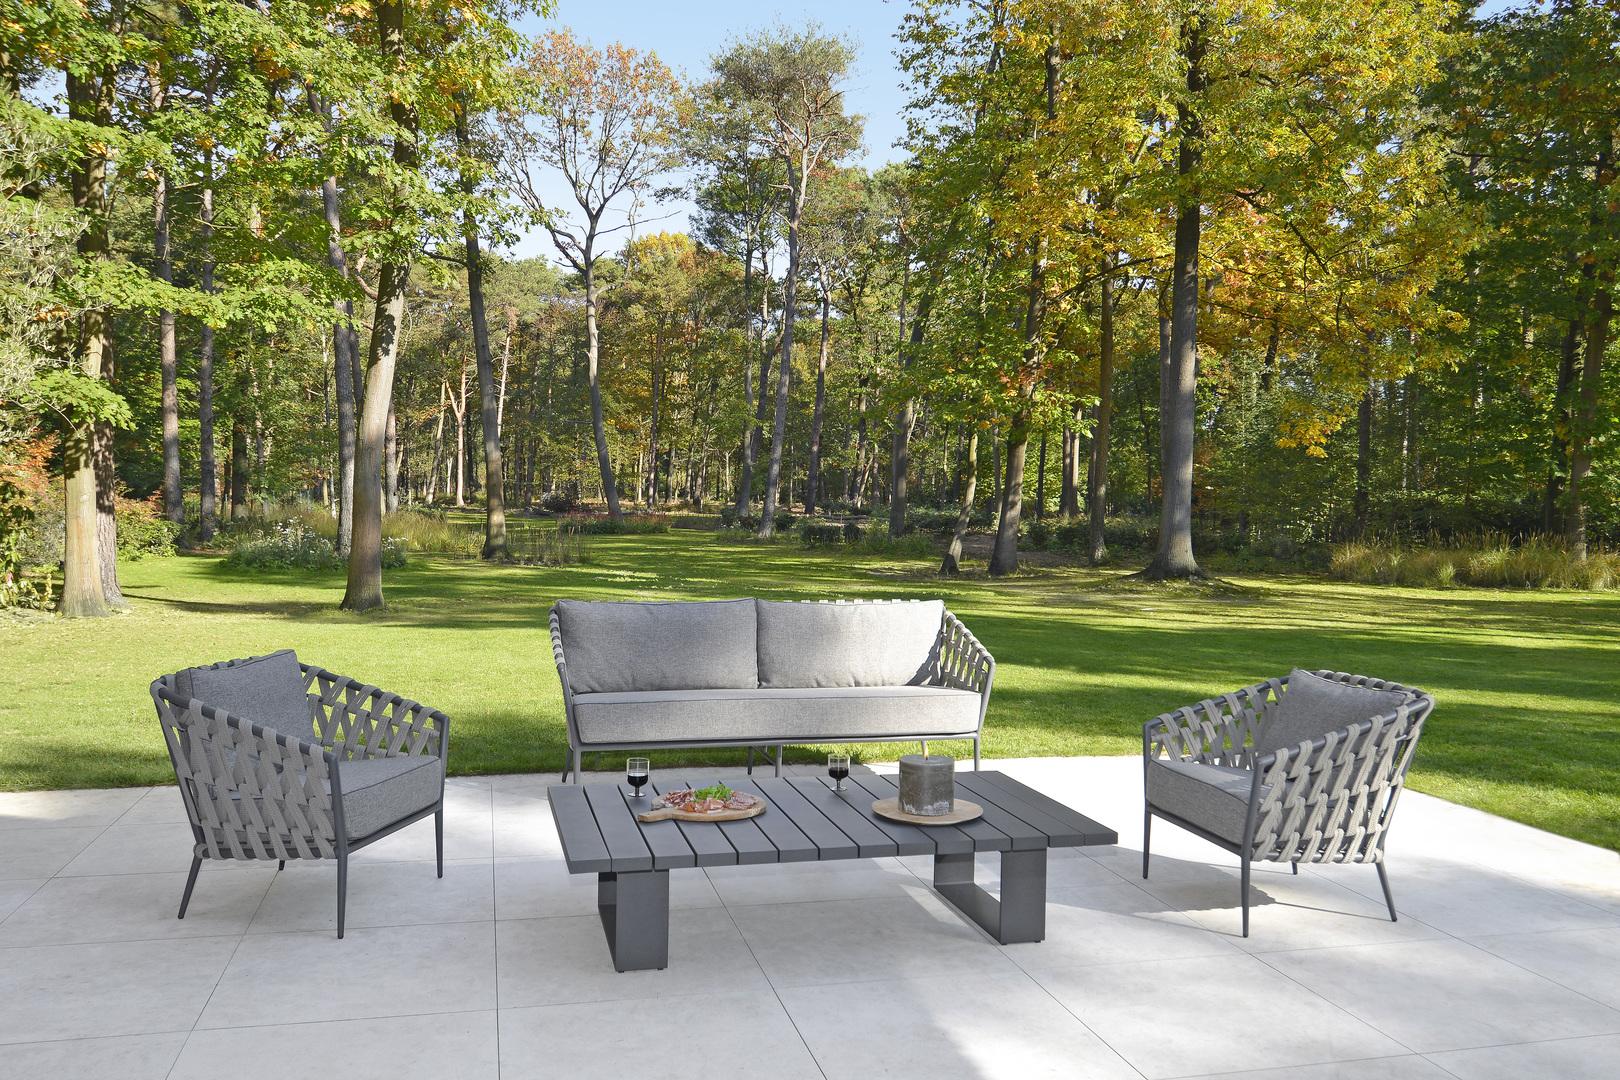 2019 Borek Ardenza belt Tavira lounge chair & sofa Studio Borek - Alu Samos coffee table Studio Borek (front view) (1).jpg